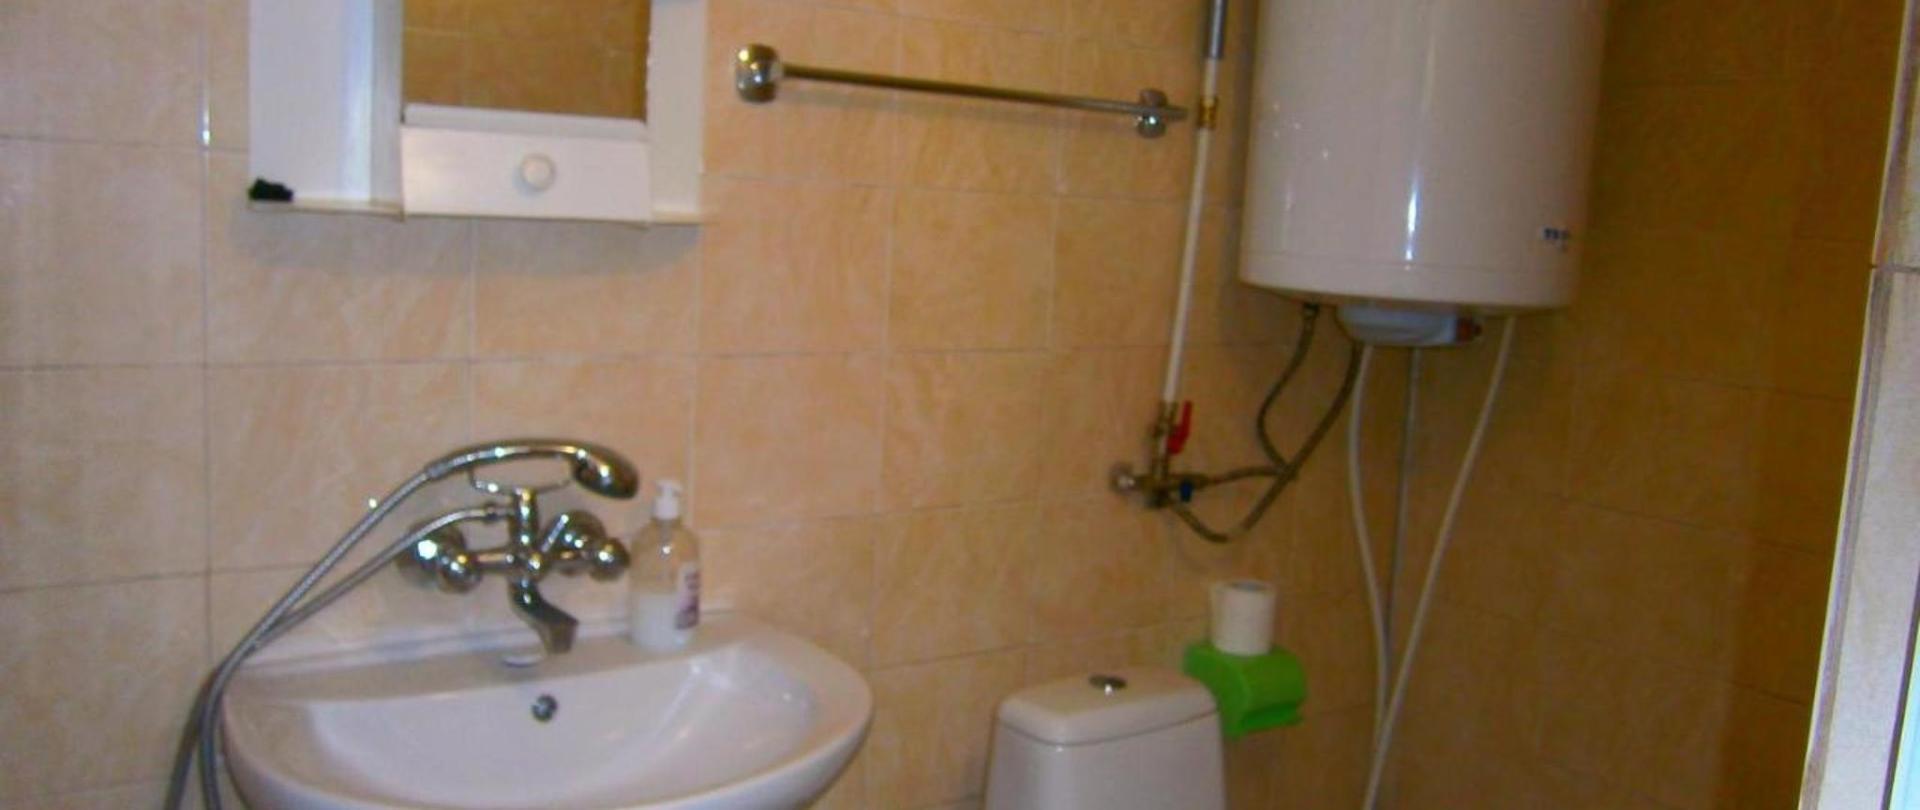 badrum med toalett, dubbelrum